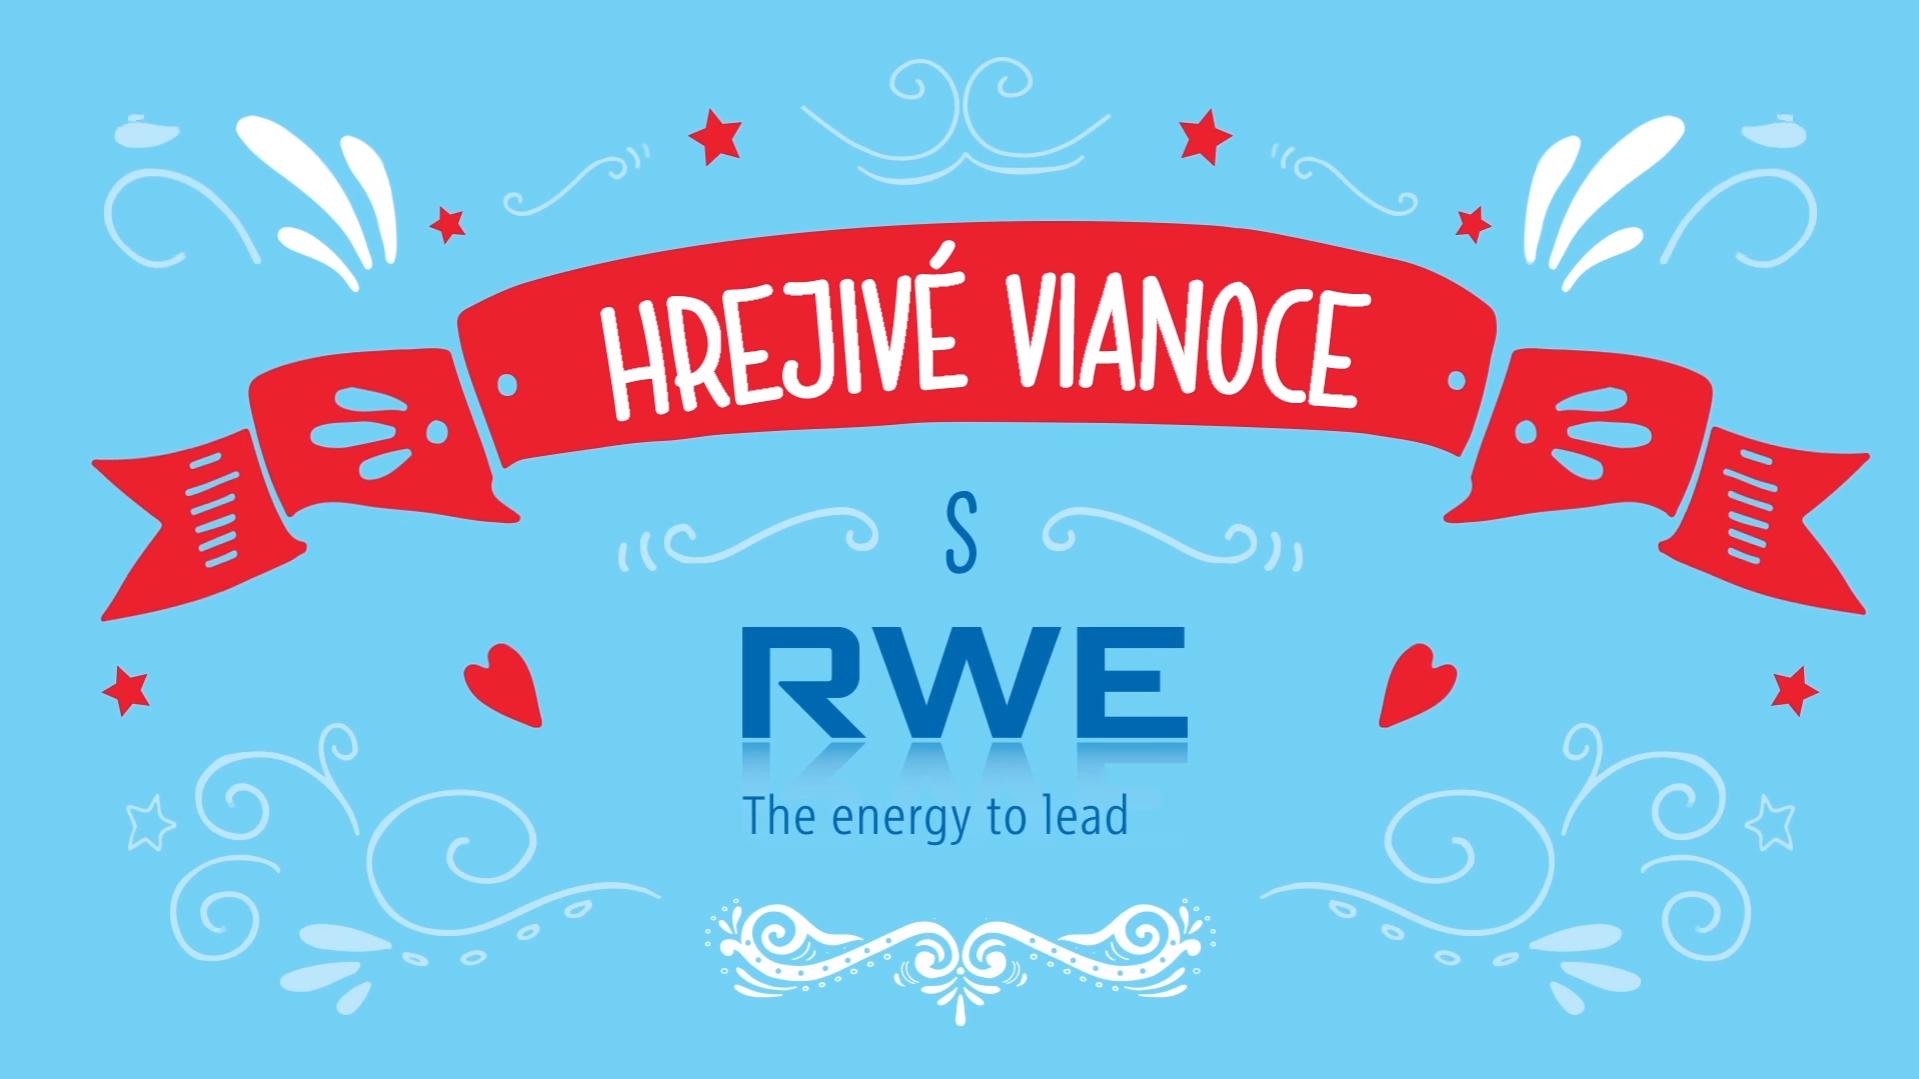 rwevianoce